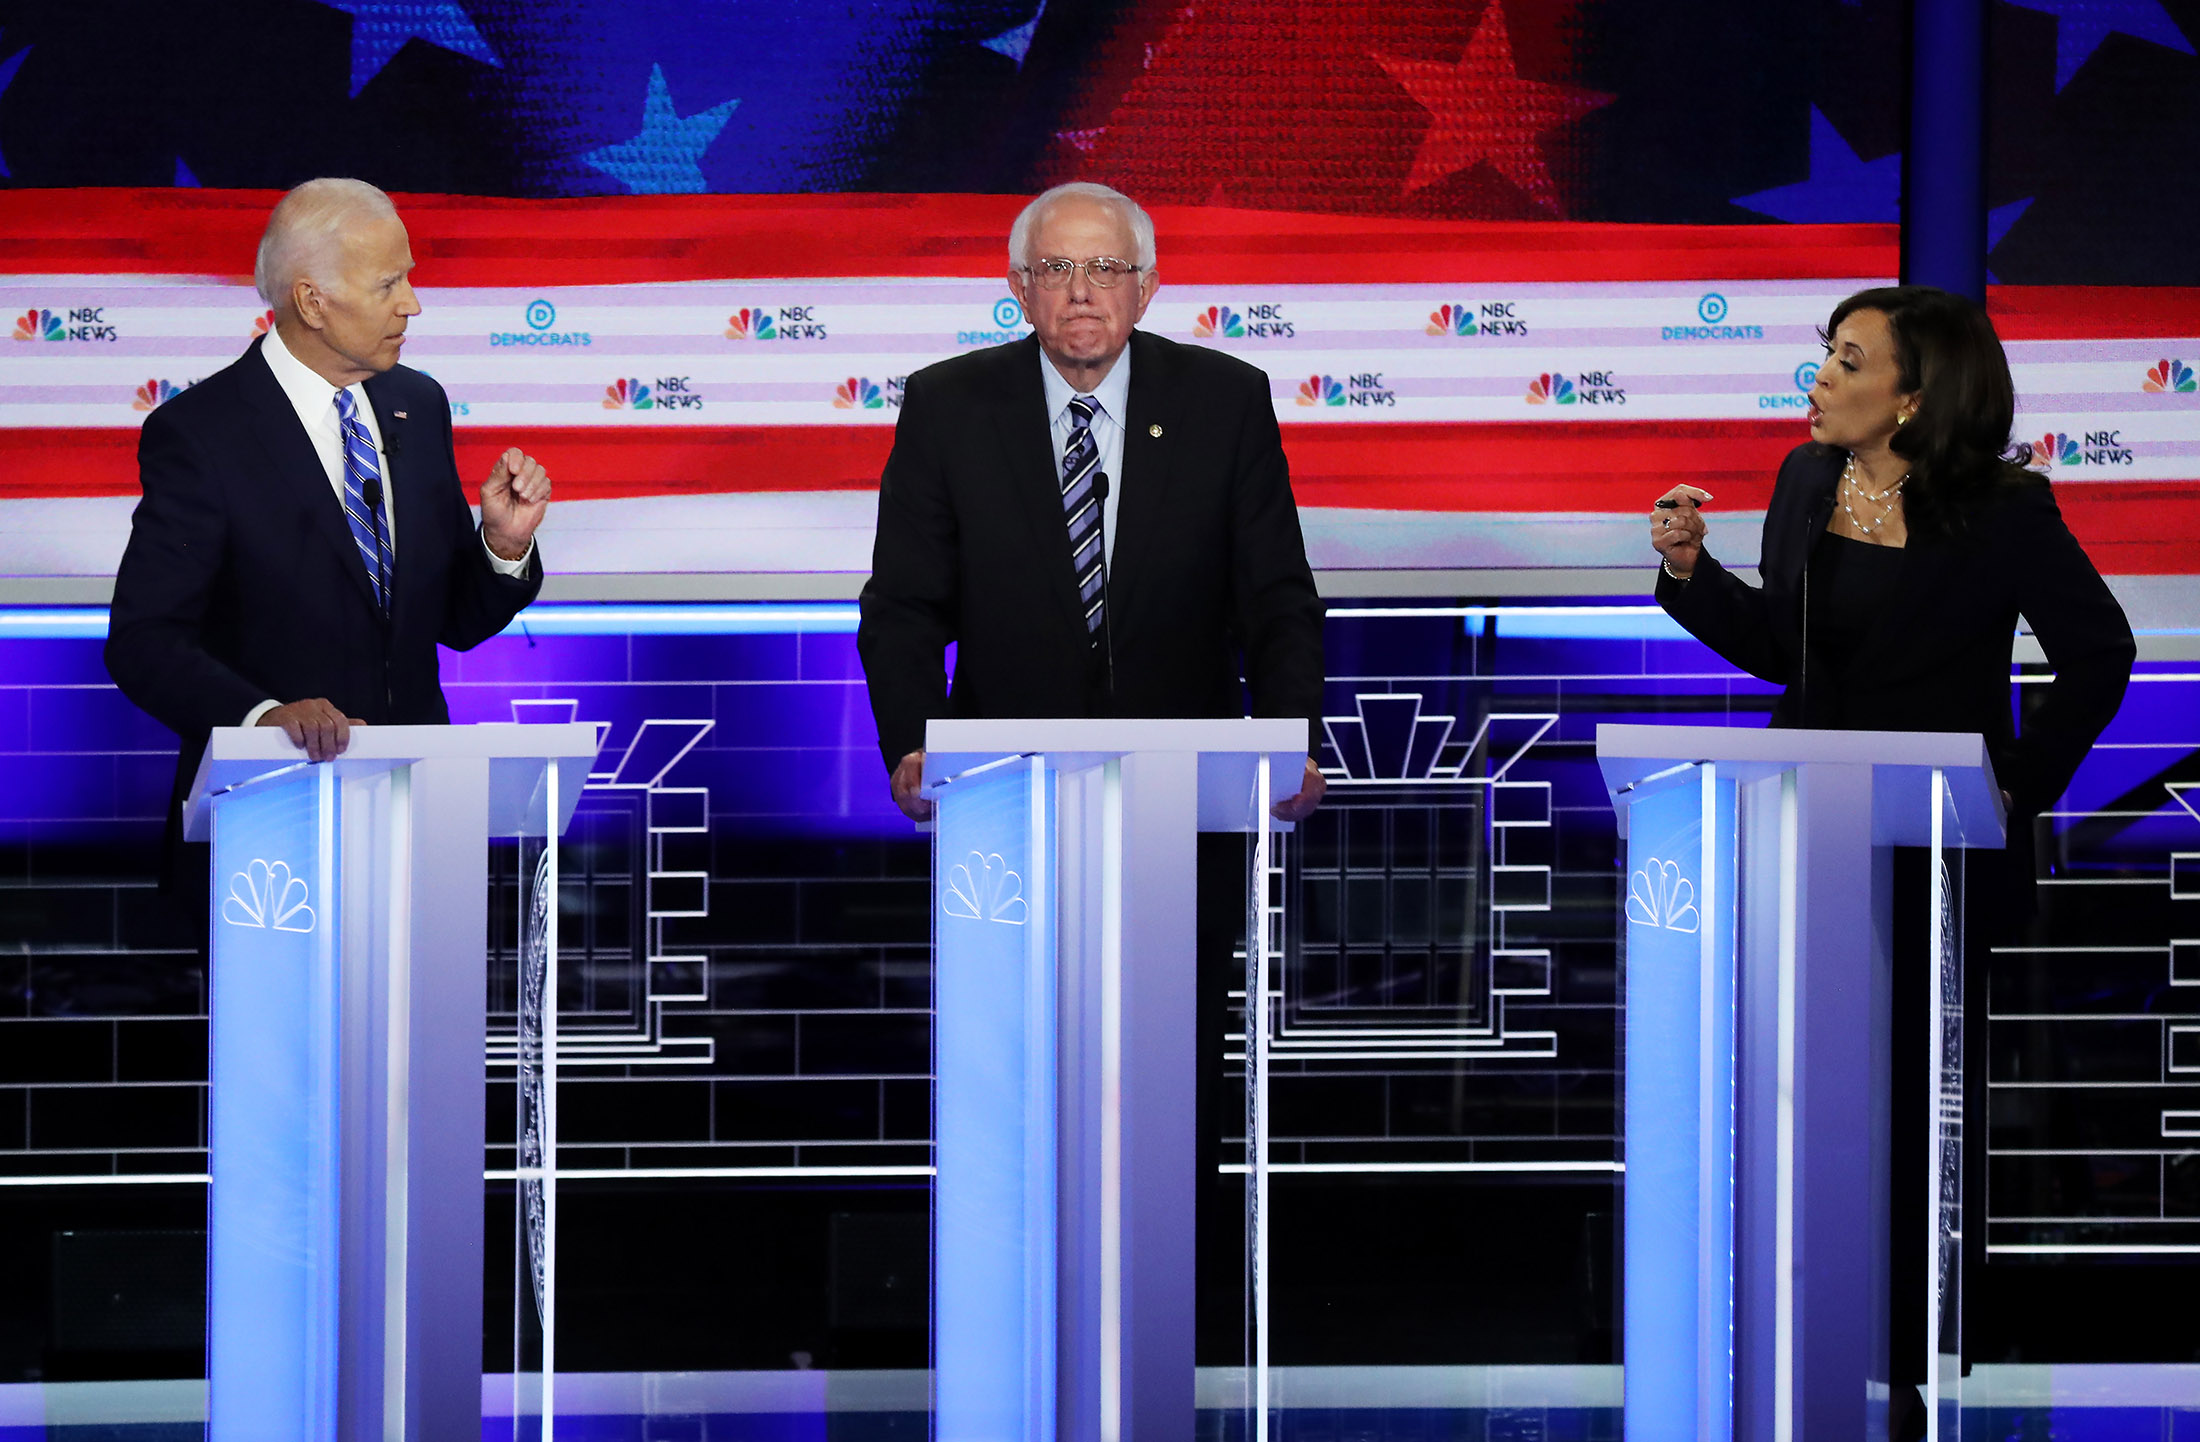 Biden's Debate Stumble Exposes His Fragile Front-Runner Status